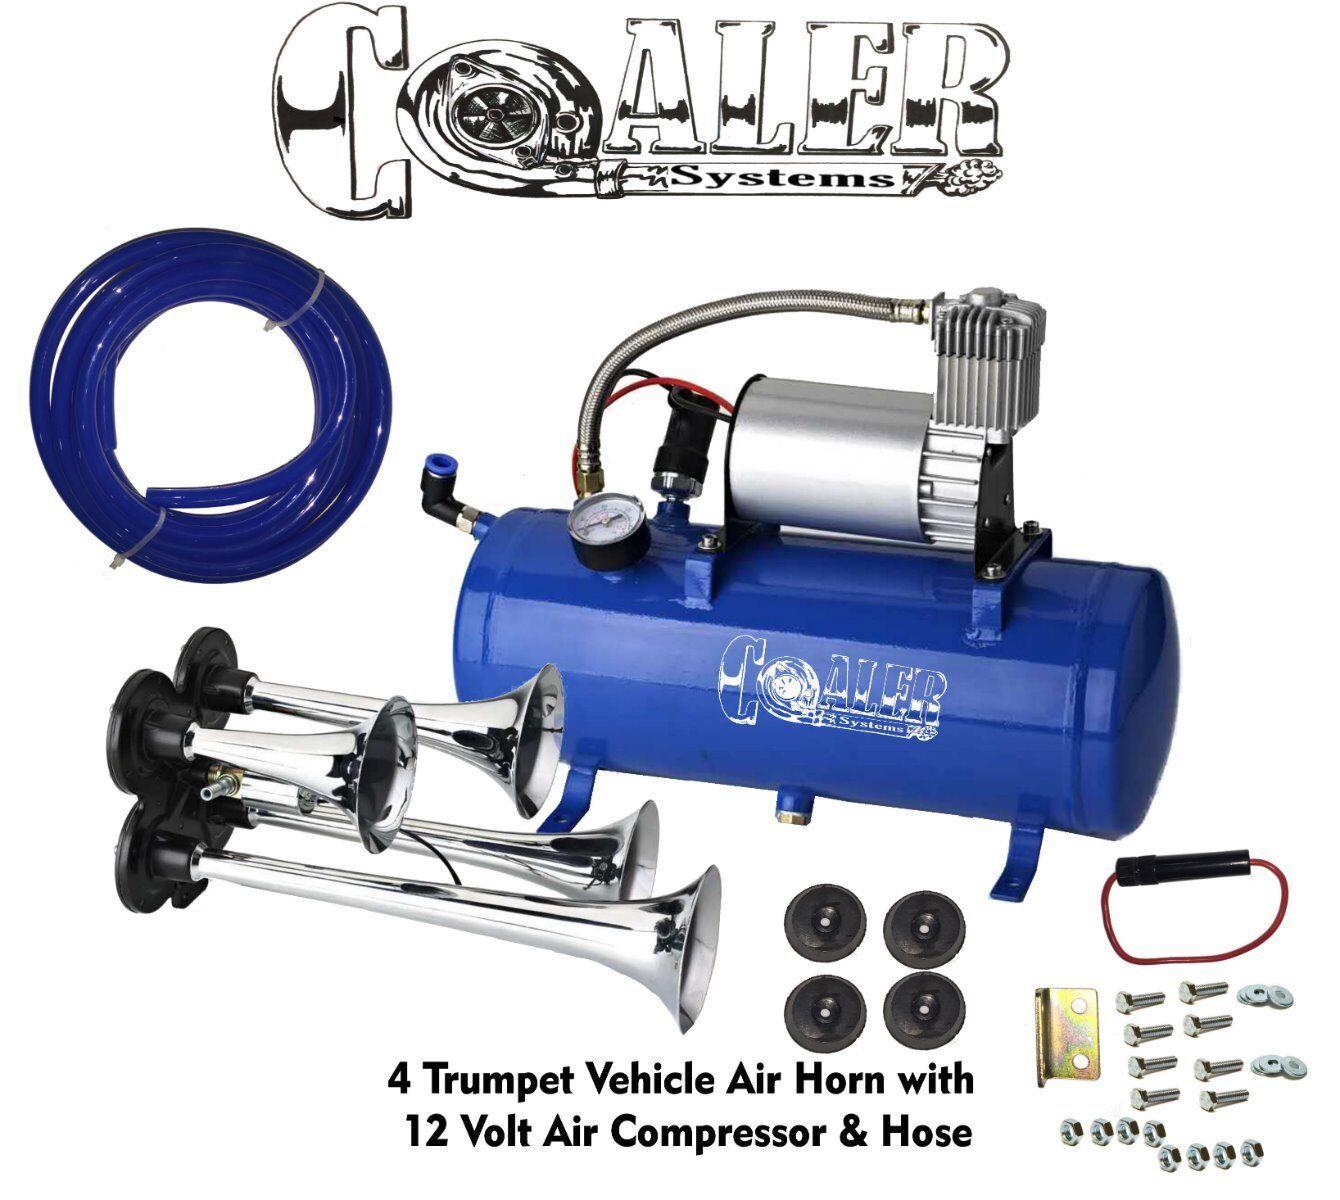 4 Trumpet Air Horn 12 Volt Compressor 18ft Hose 150 dB Train 120 PSI Truck Kit